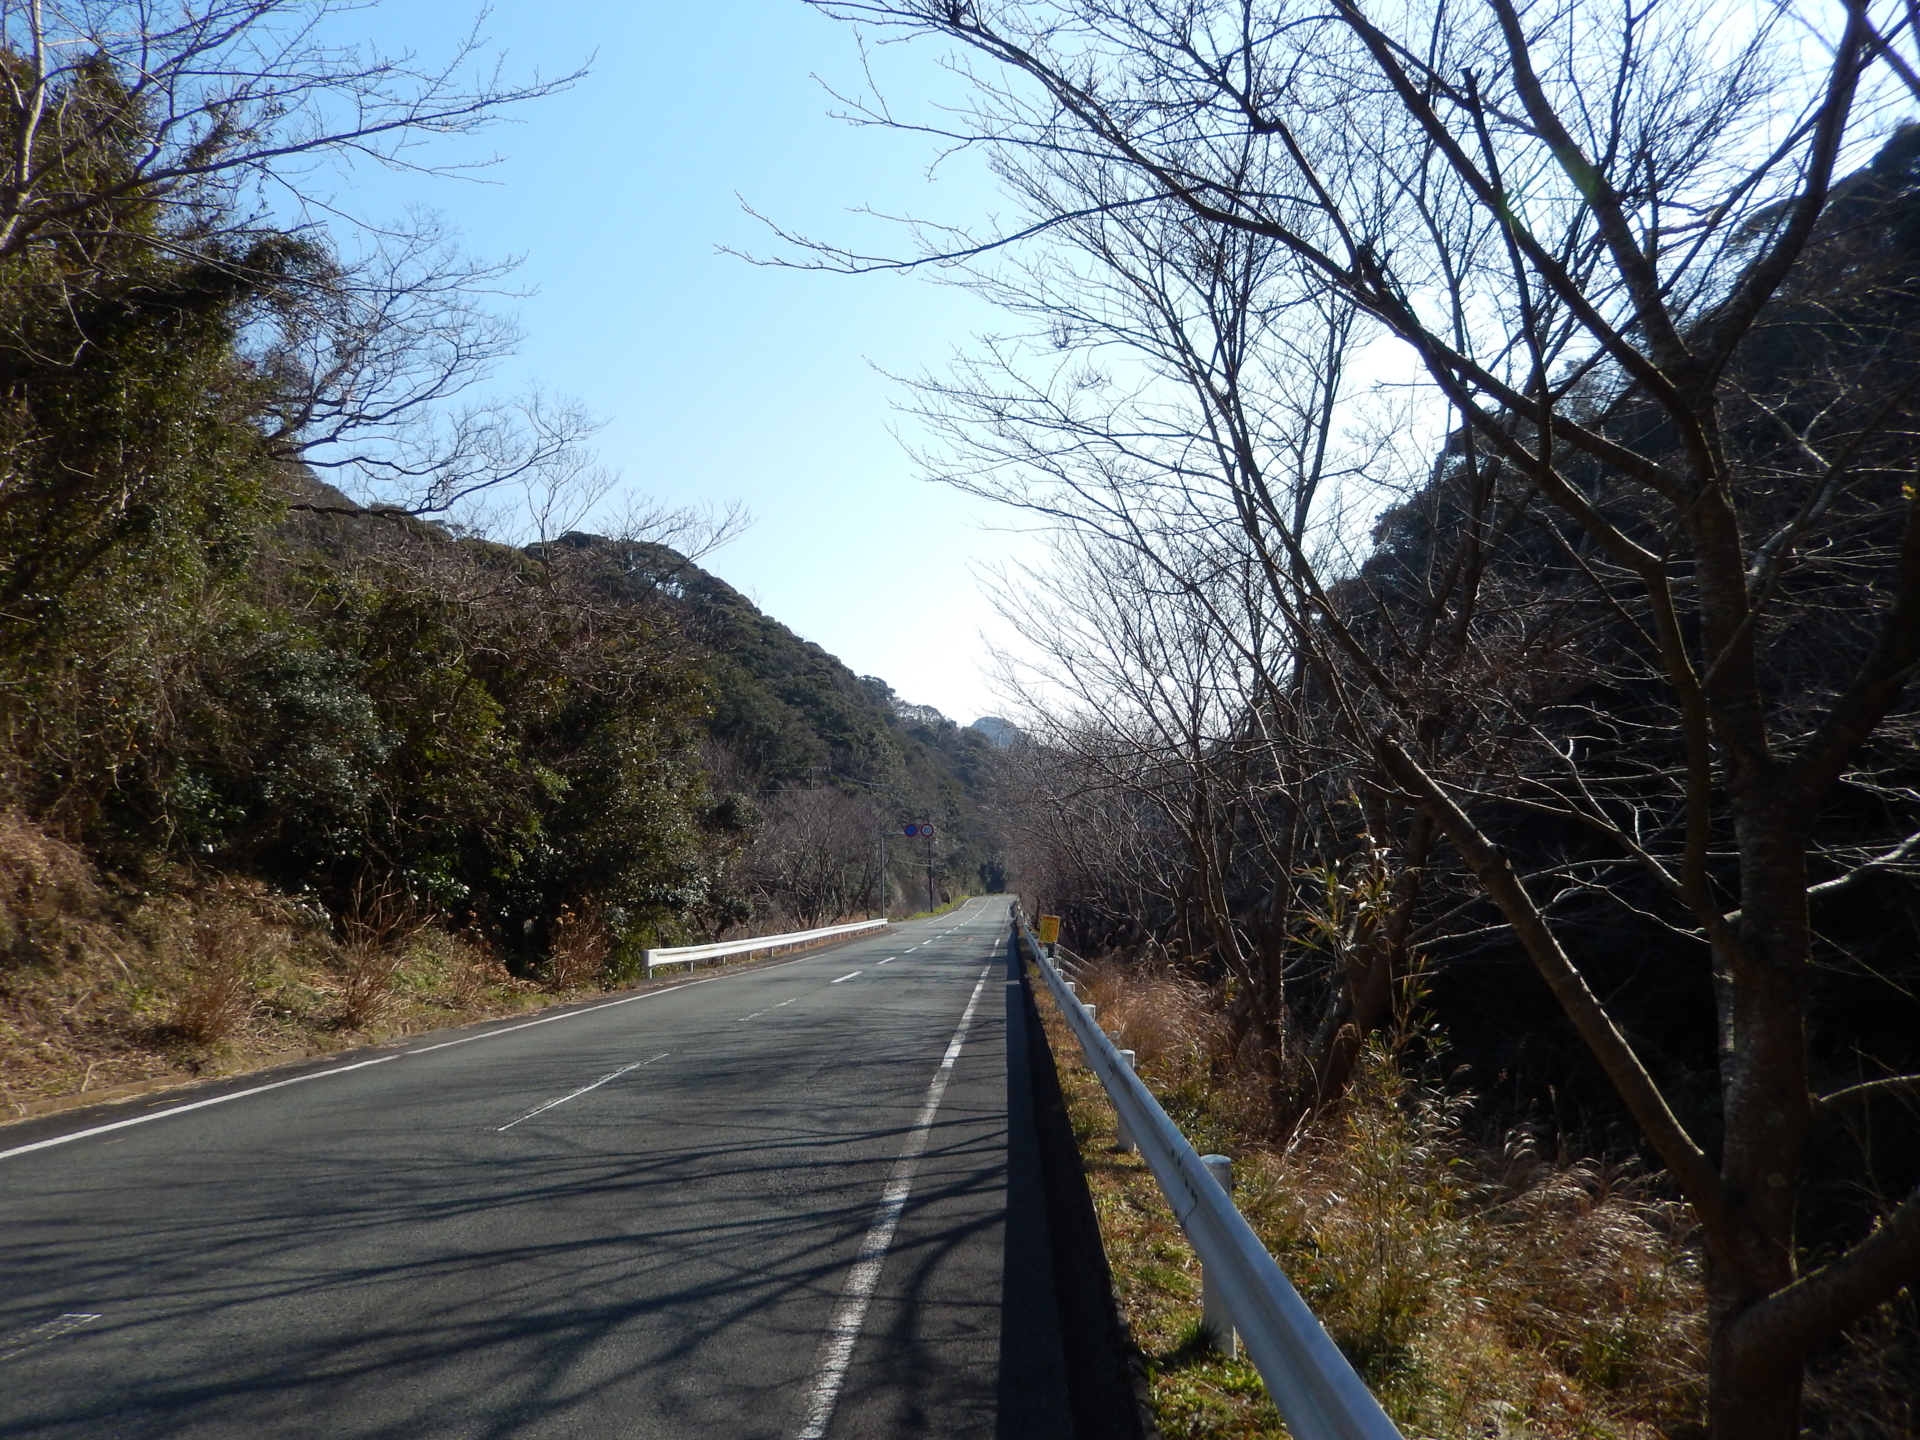 f:id:ToshUeno:20150215140339j:plain